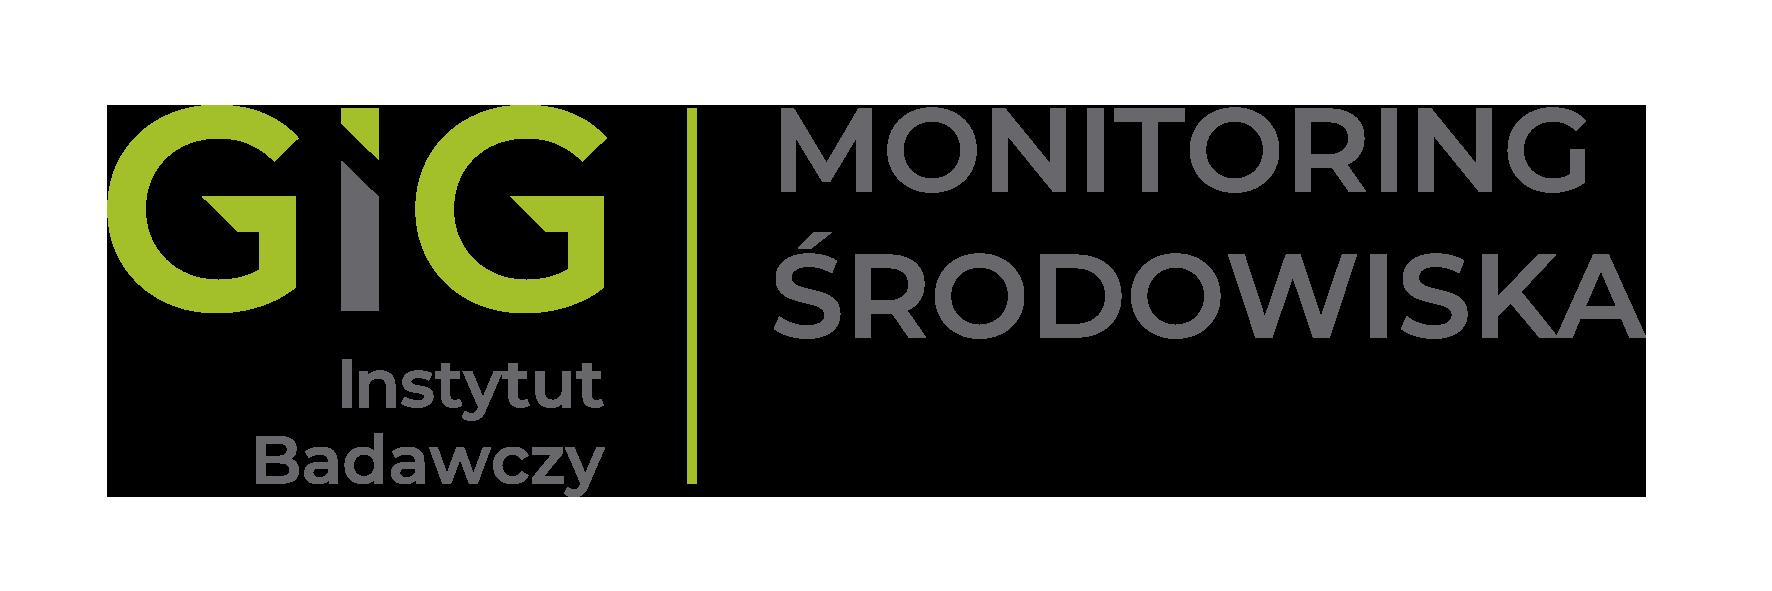 Monitoring Środowiska | GIG Instytut Badawczy